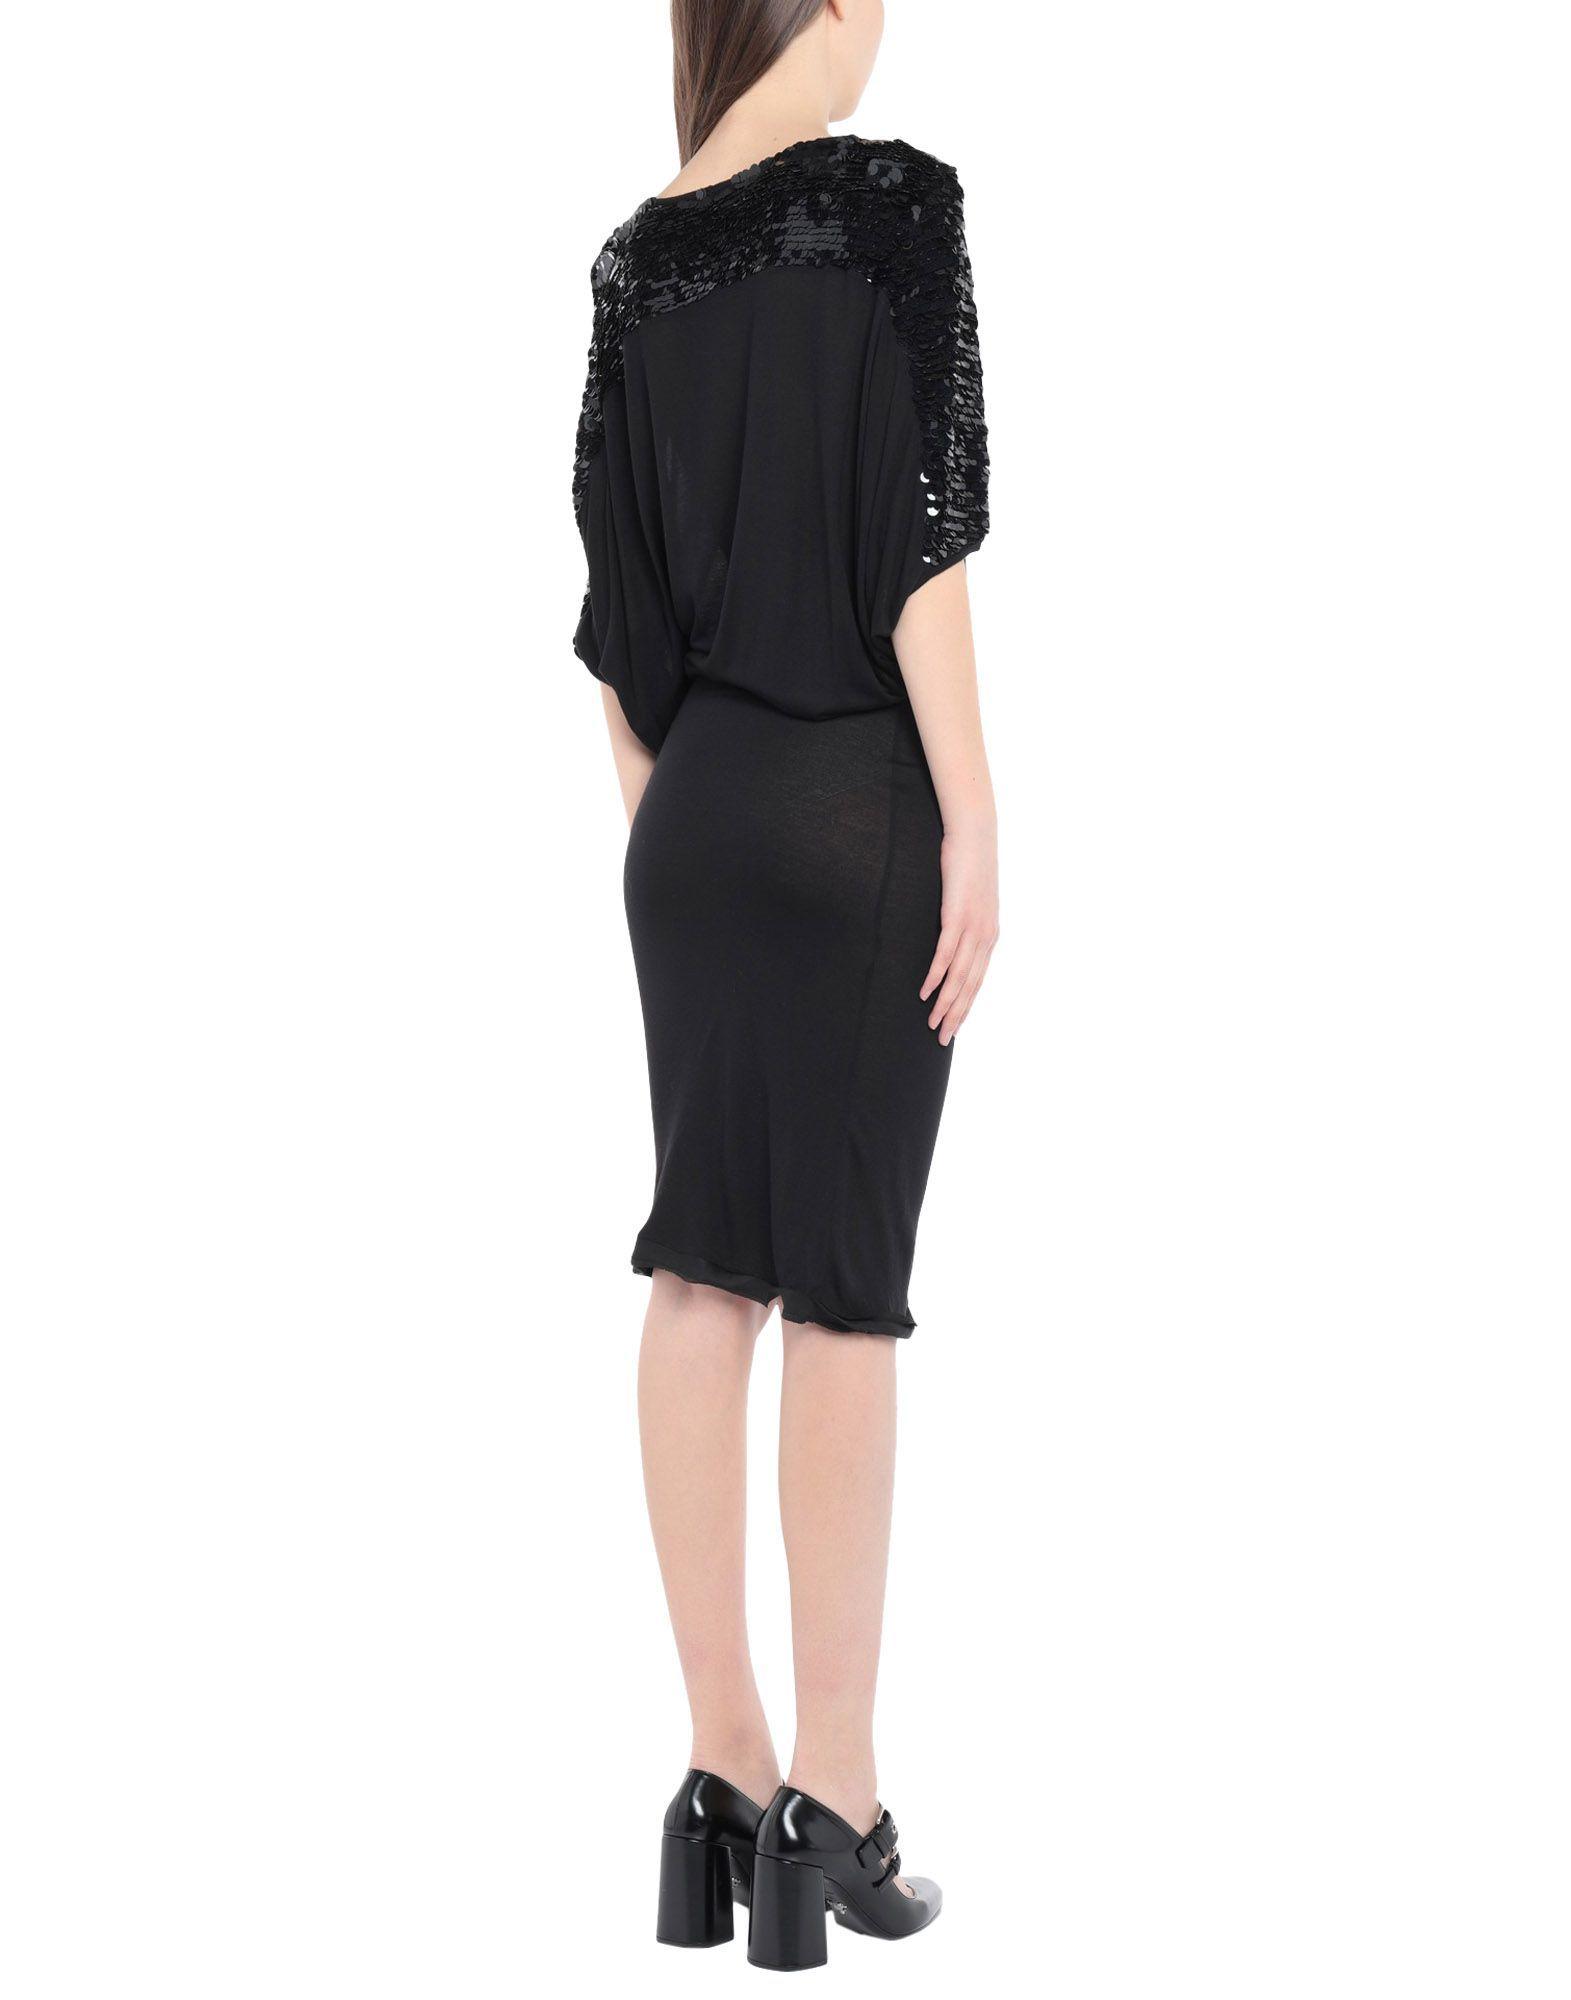 DRESSES Woman Lanvin Black Viscose